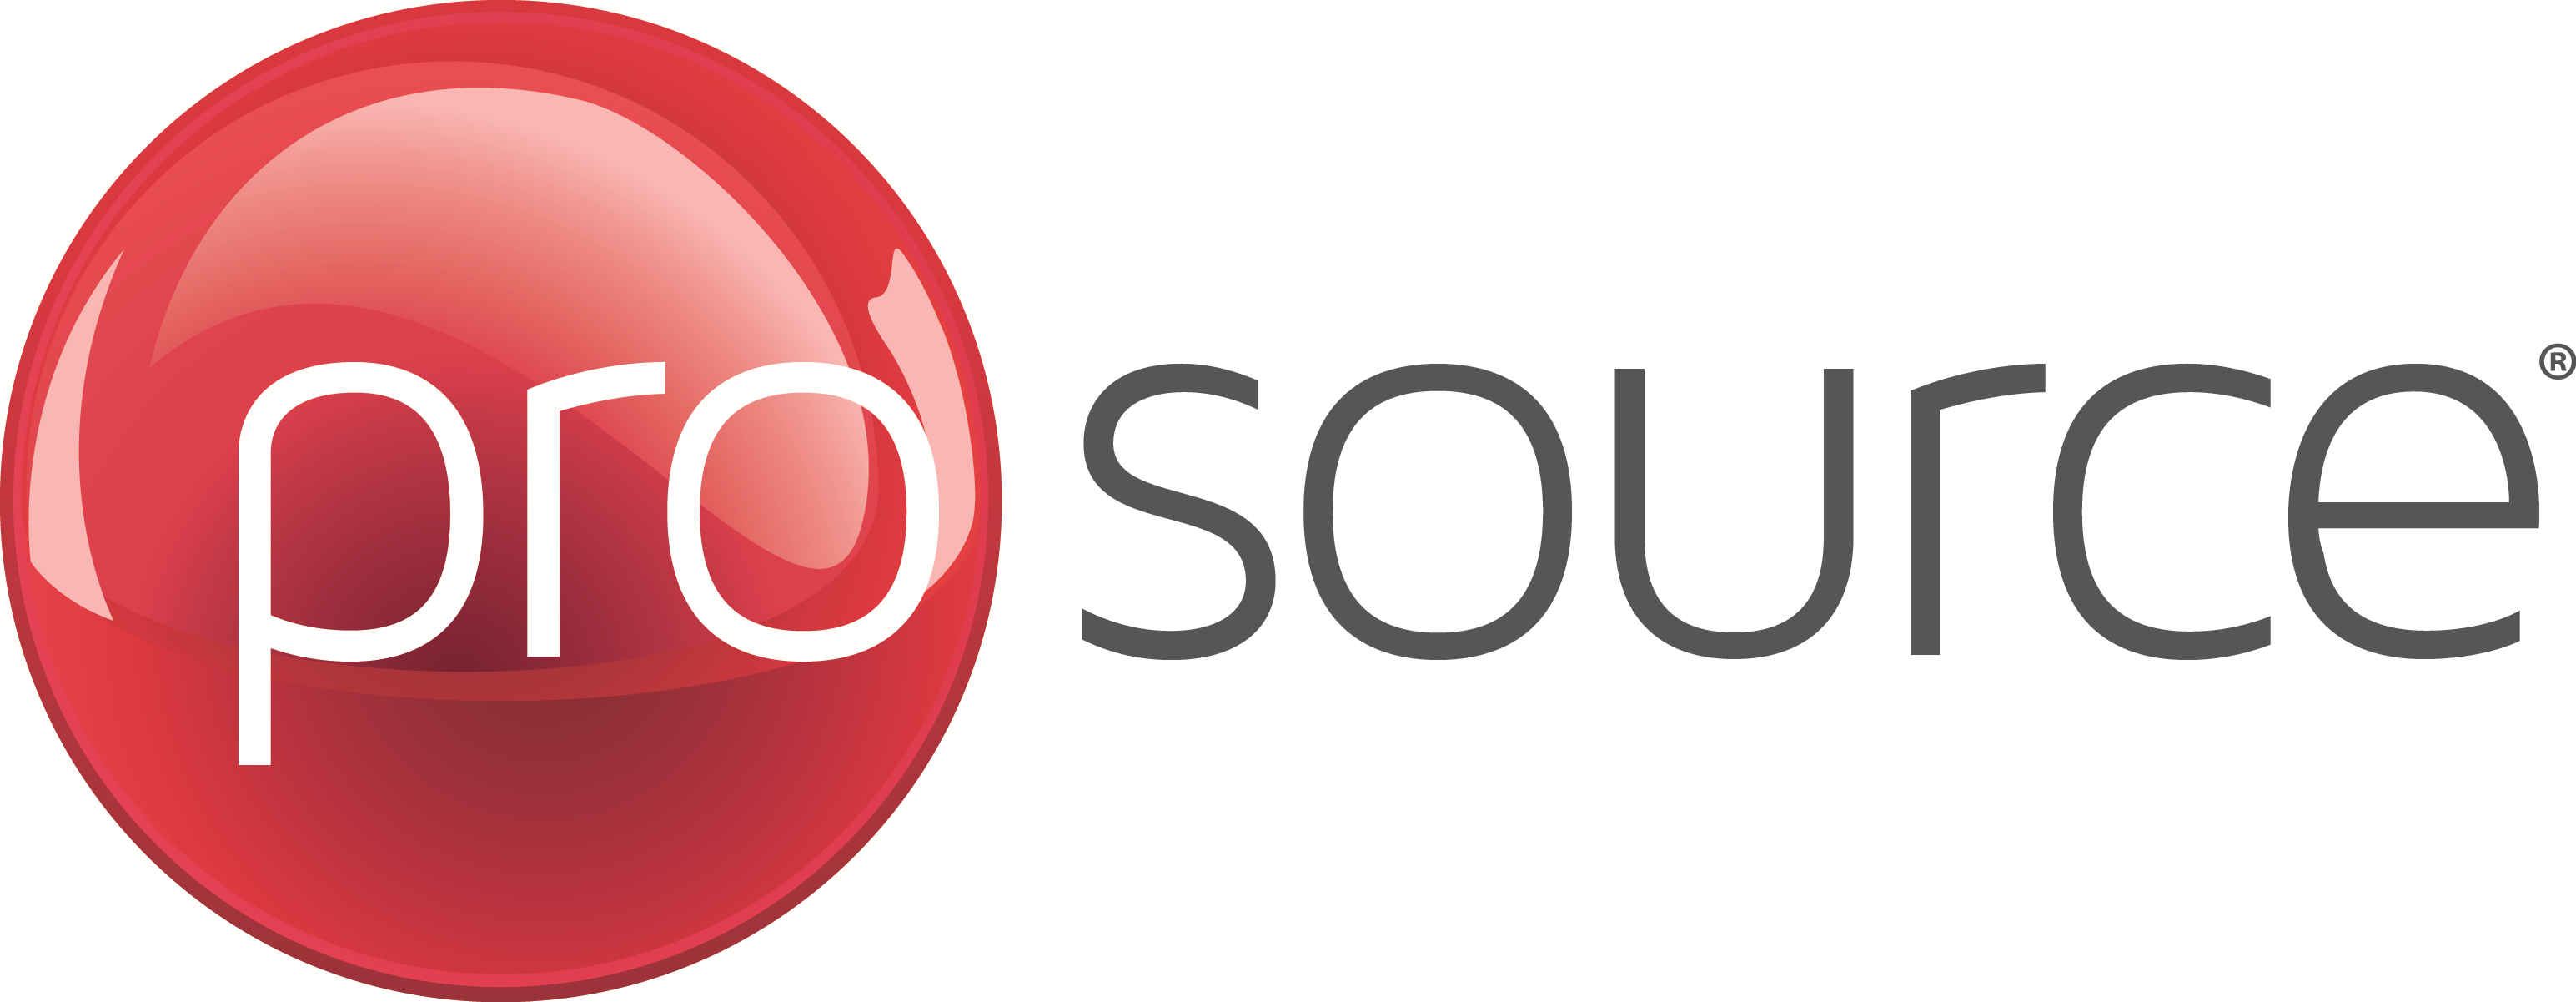 Prosource Company Logo